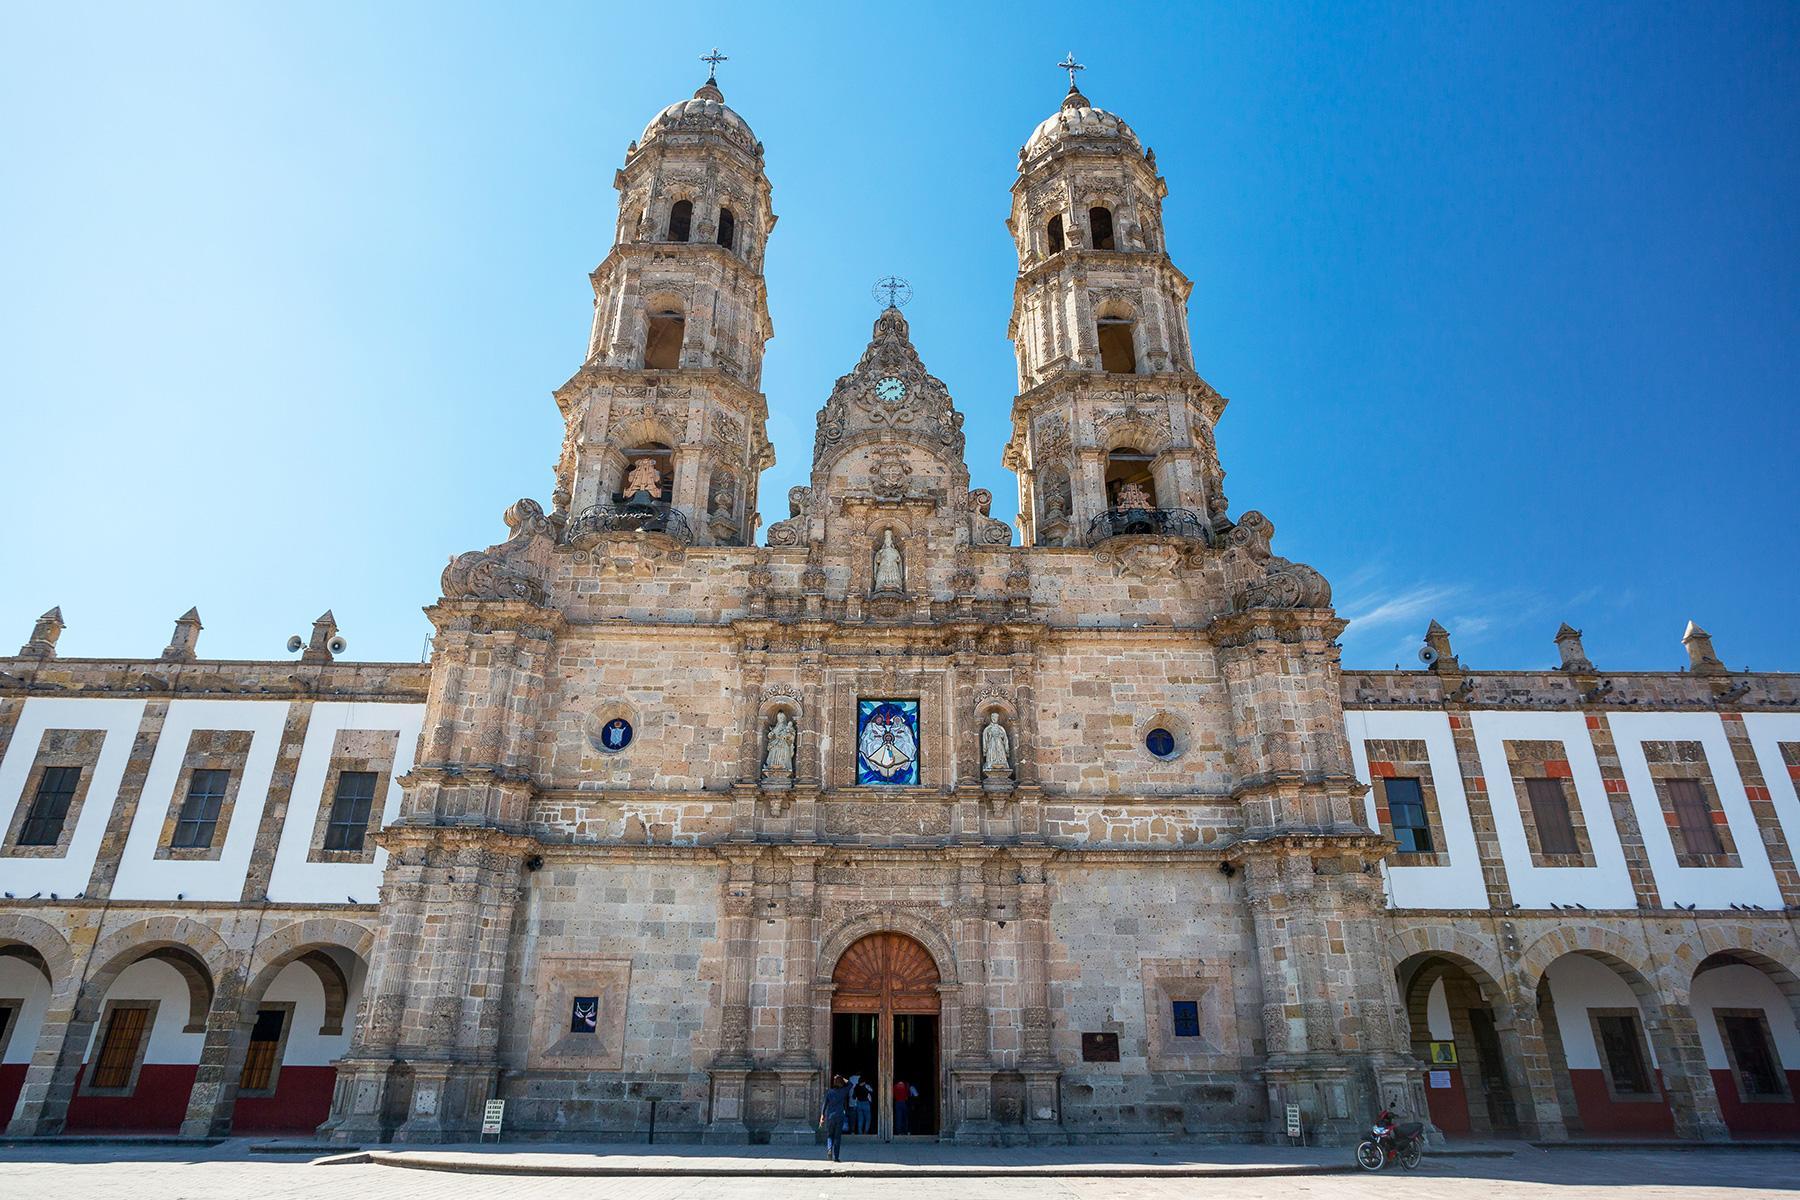 12-Reasons-Underrated-Guadalajara-Hero